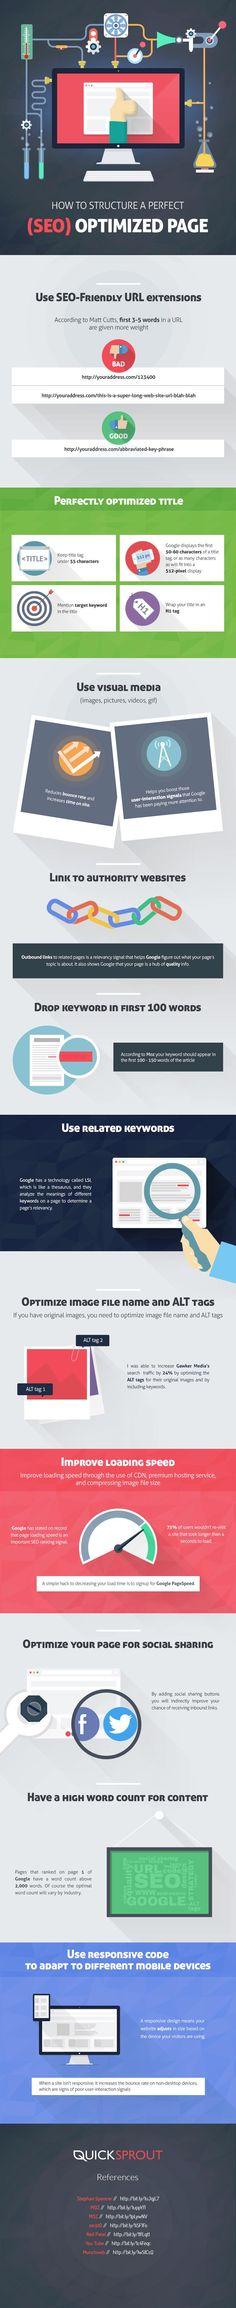 Die perfekte #SEO-optimierte Website. #Infografik